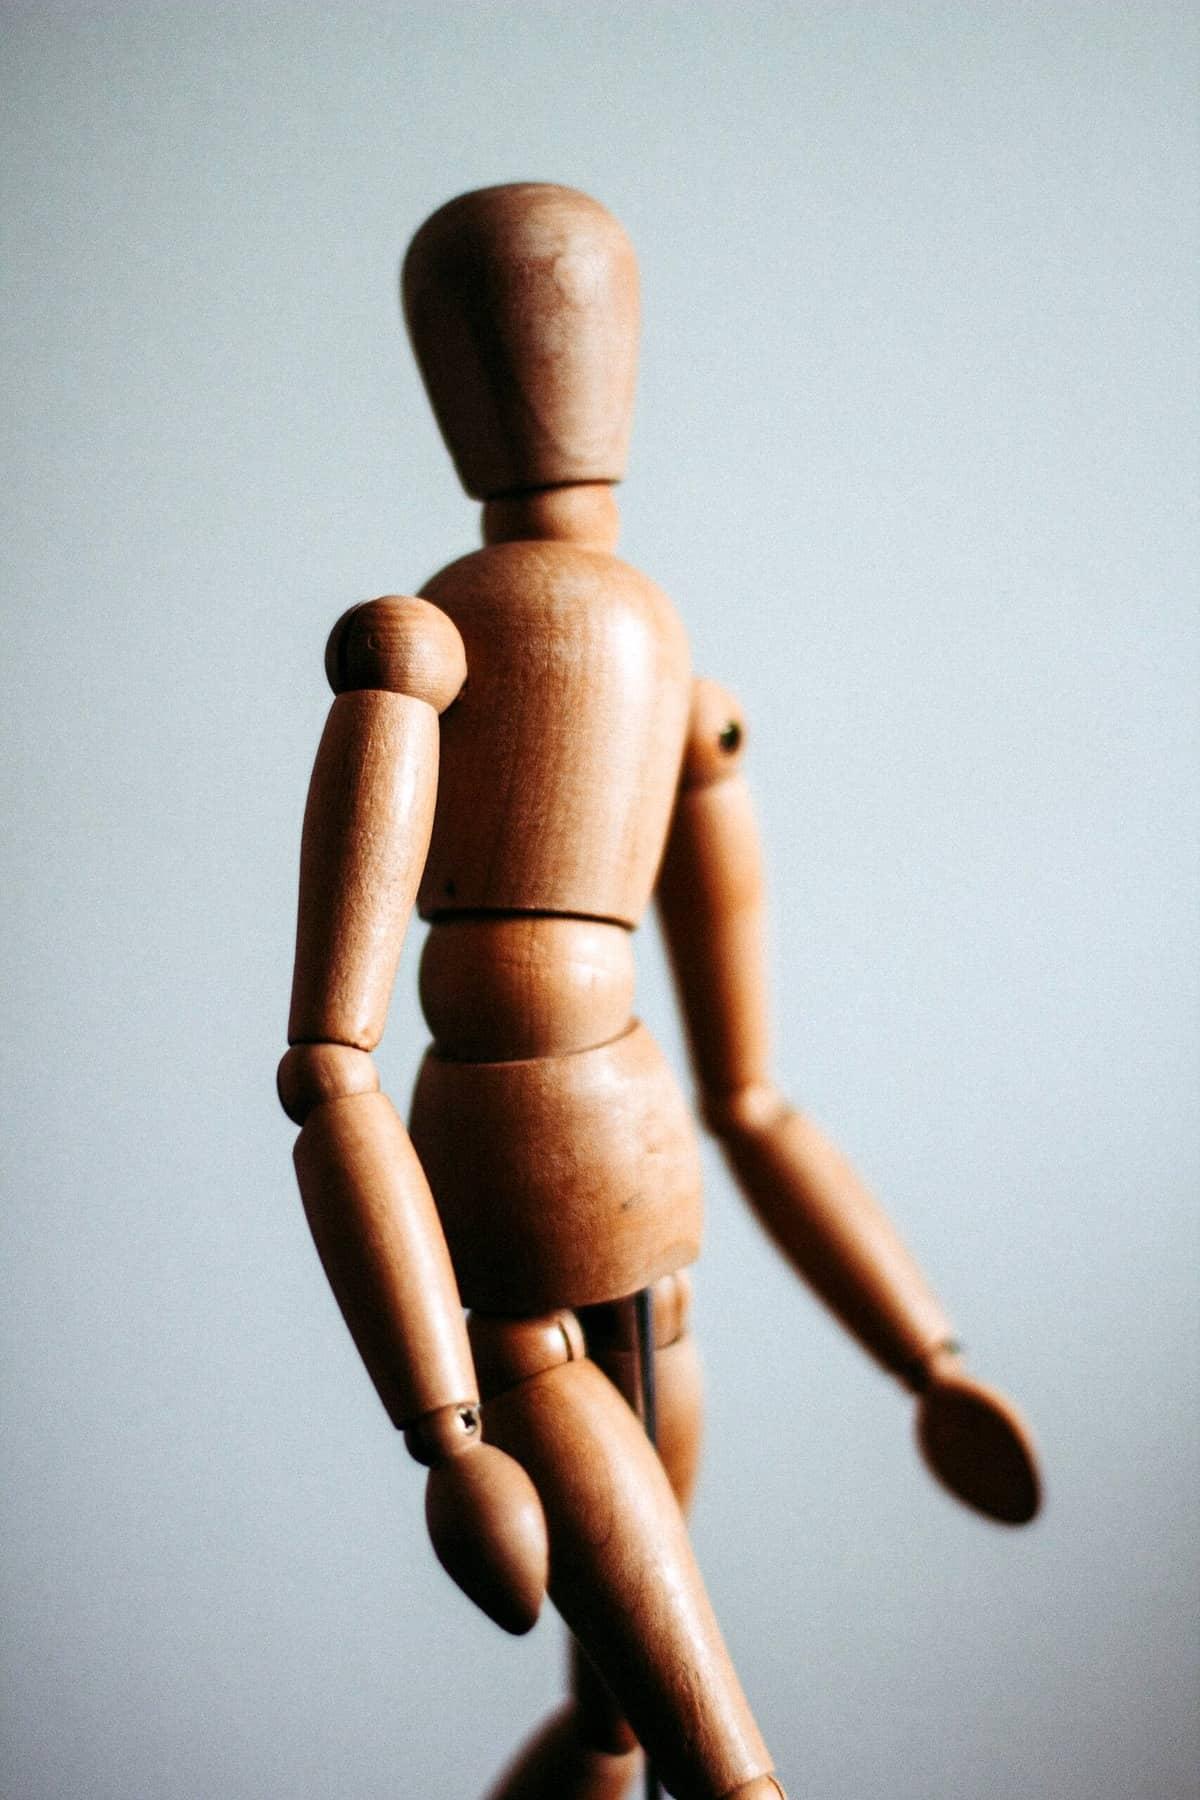 A wooden dummy.